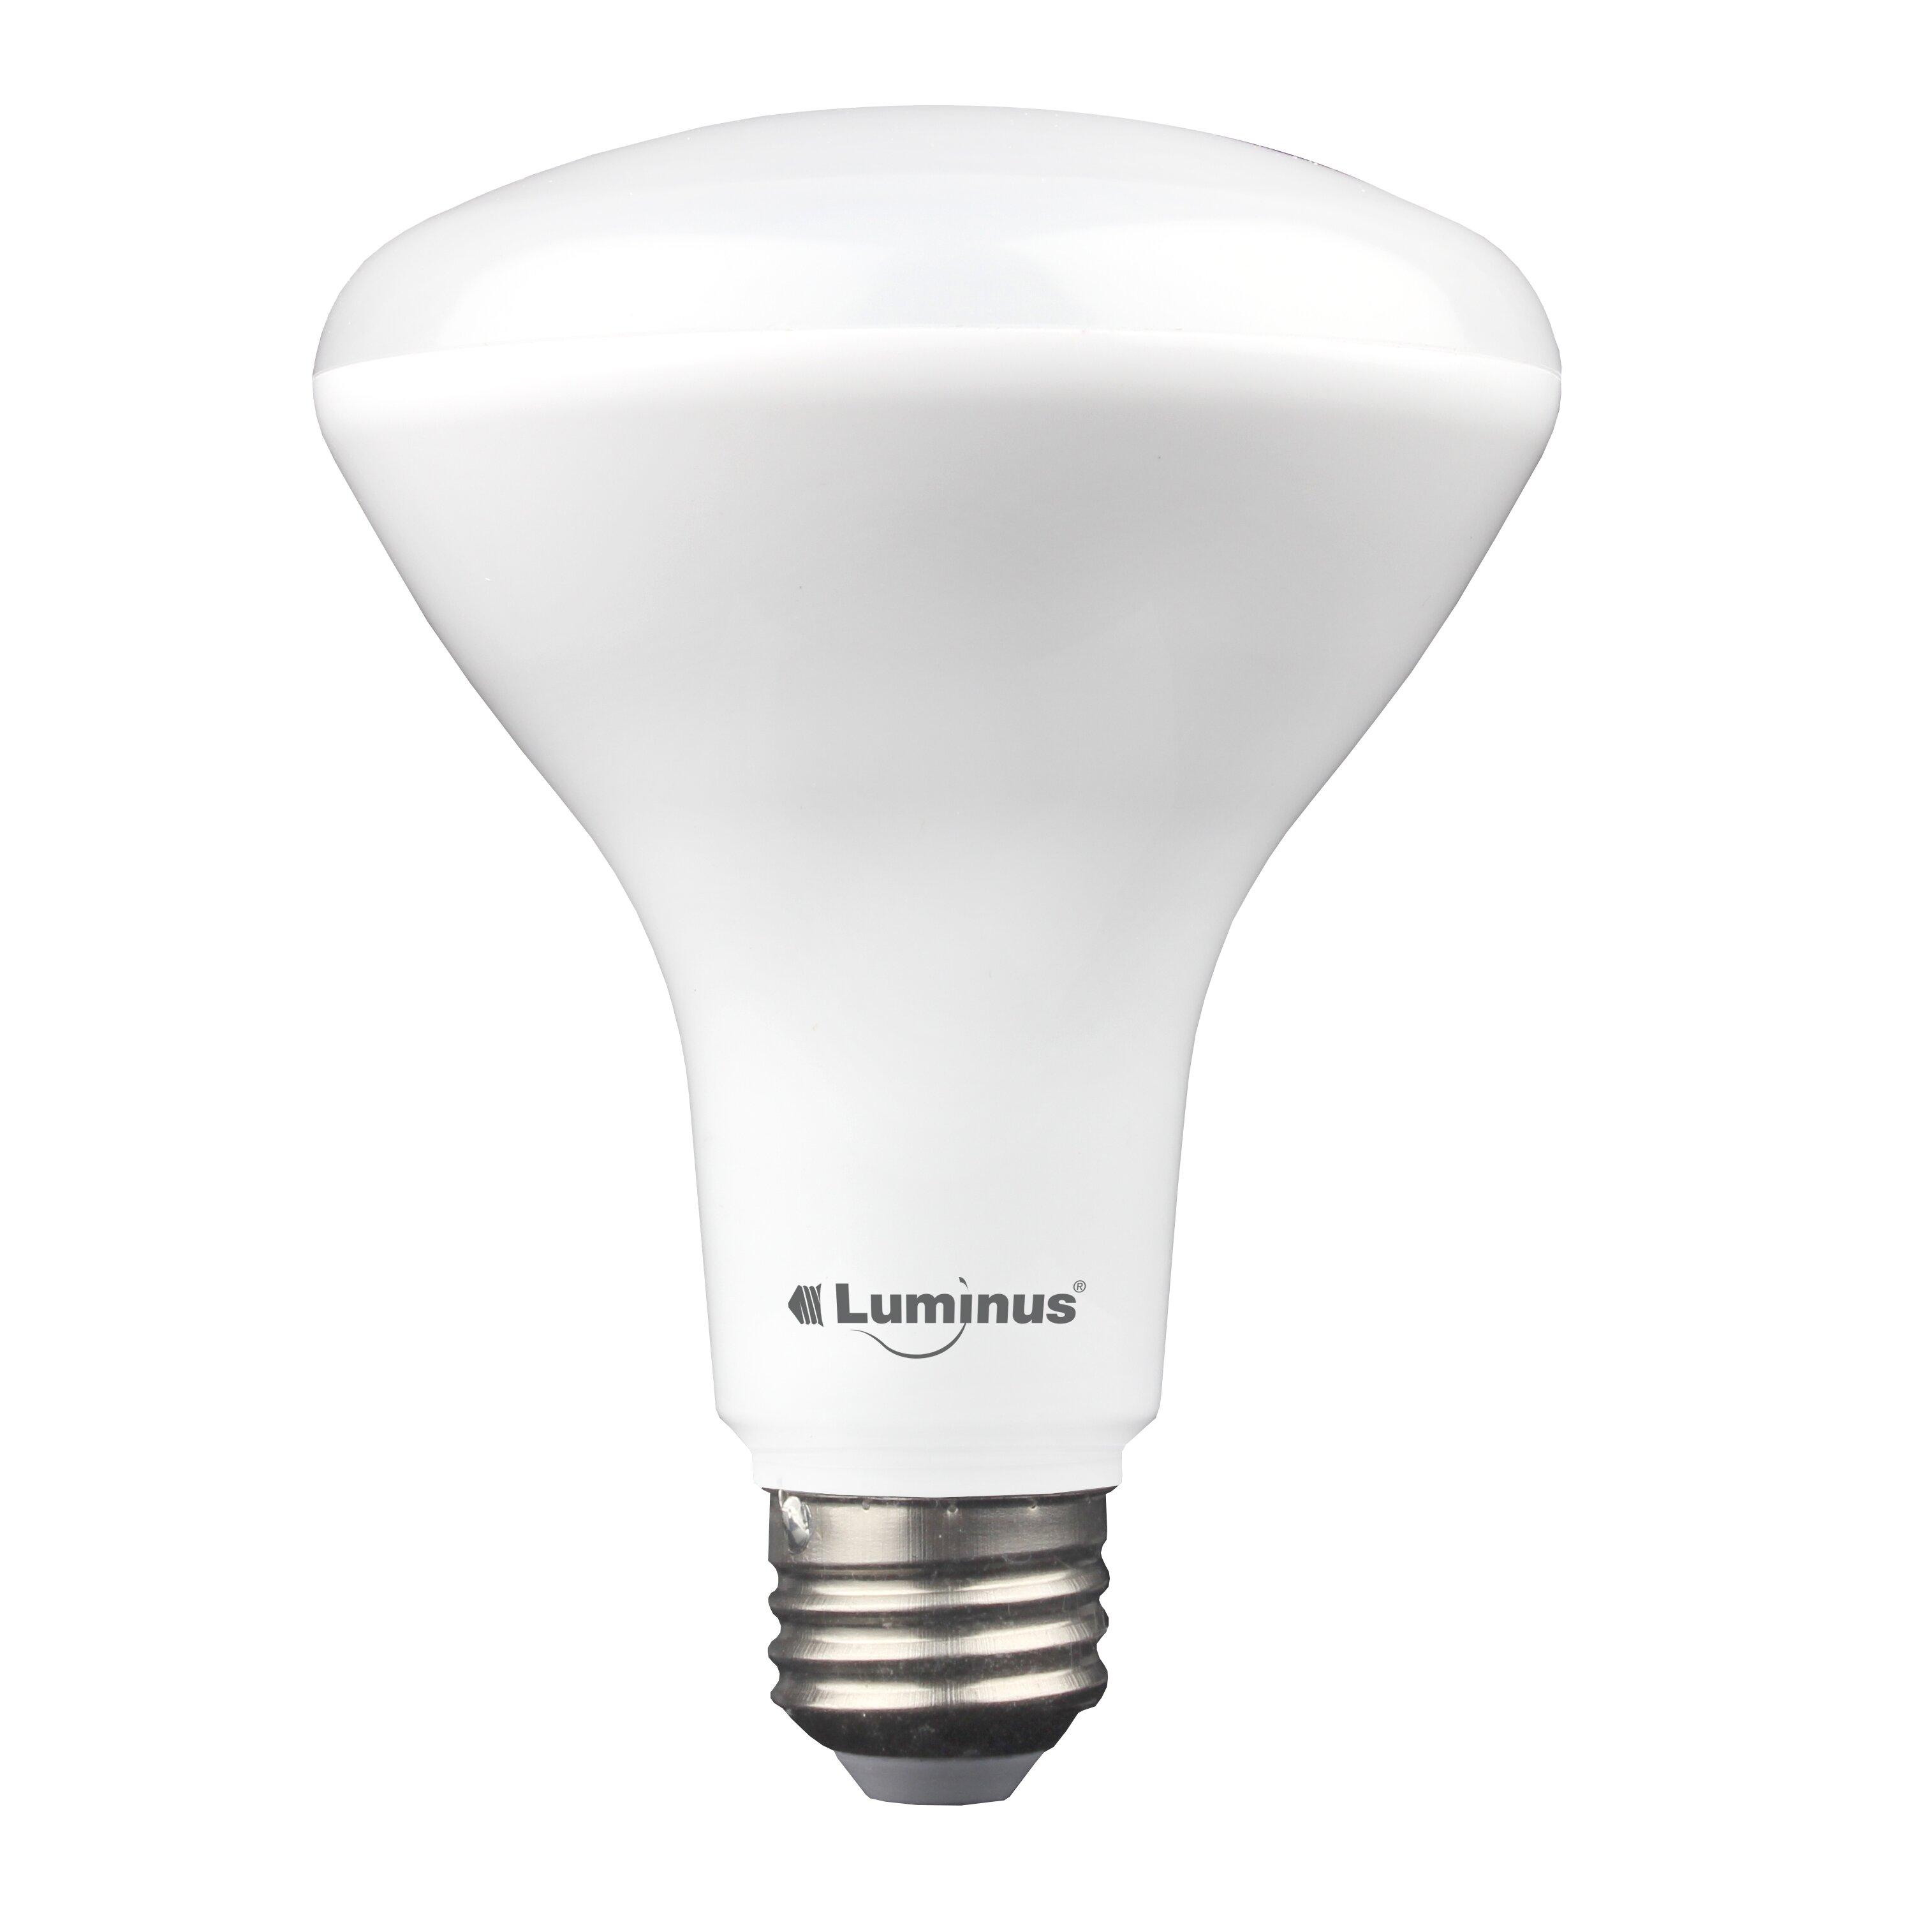 luminus 11w br30 medium led light bulb pack of 6 reviews. Black Bedroom Furniture Sets. Home Design Ideas